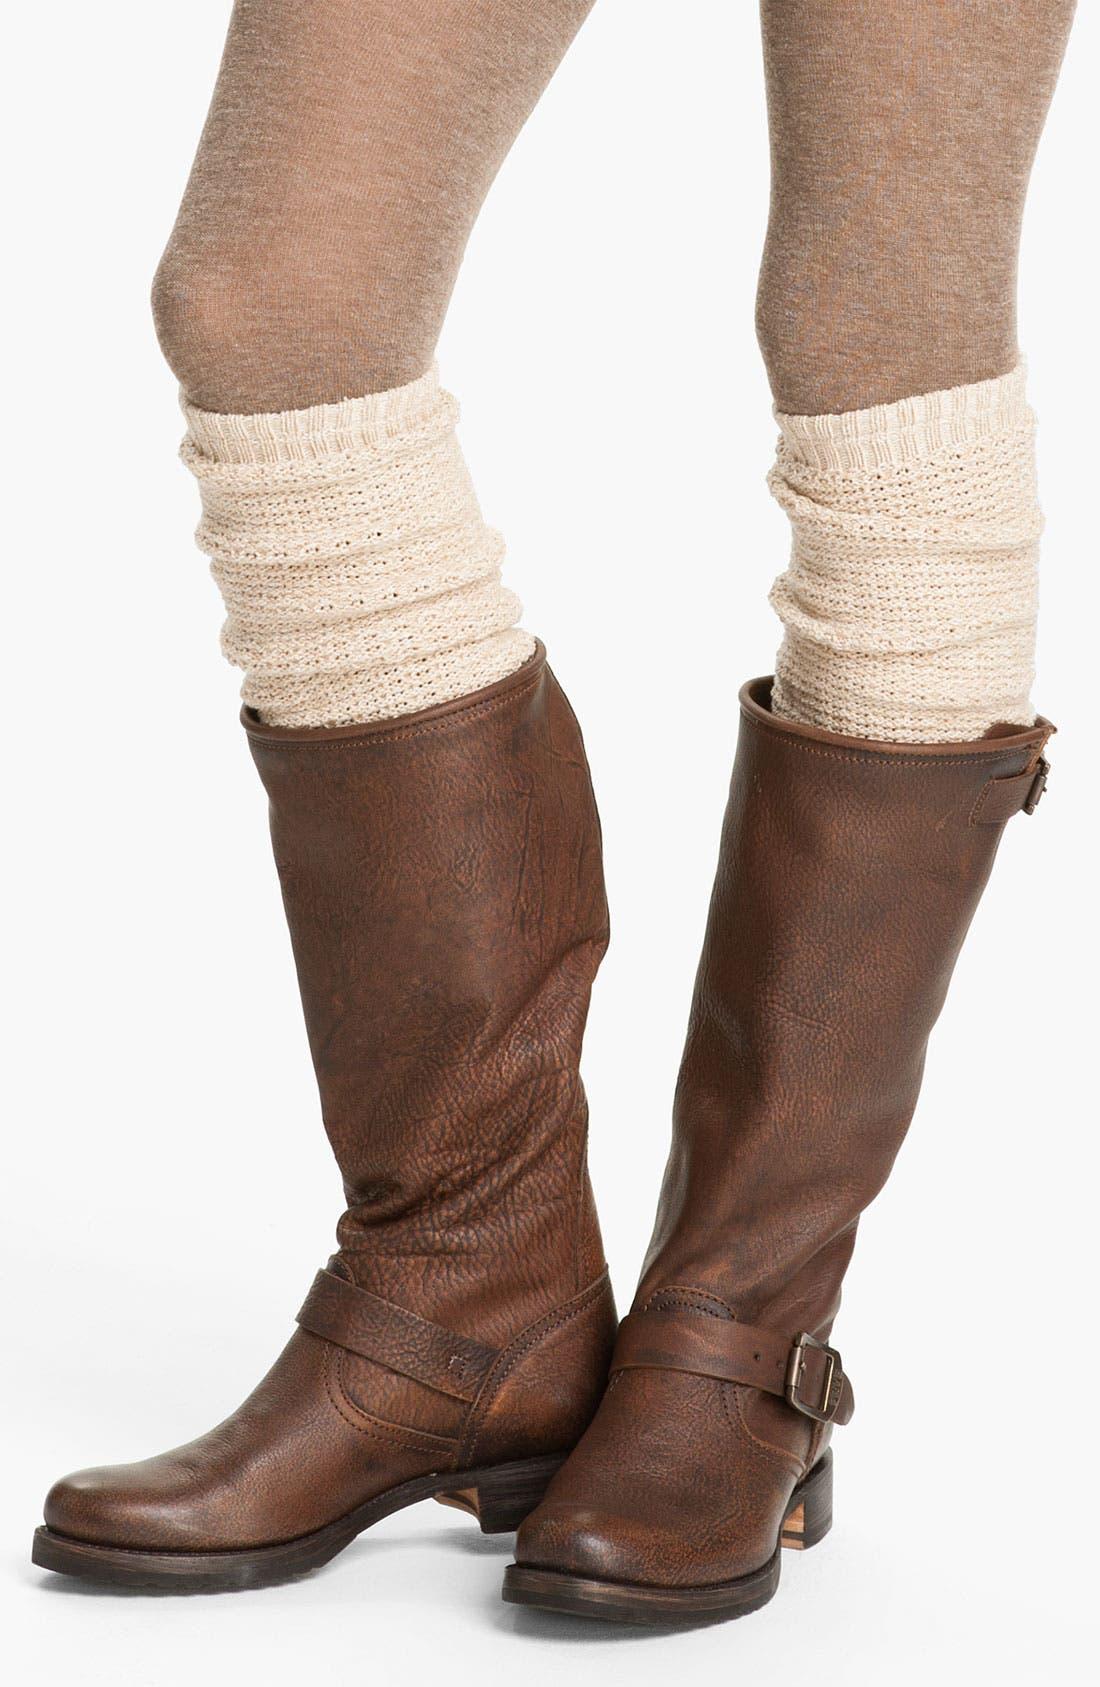 Main Image - Nordstrom Chunky Leg Warmers